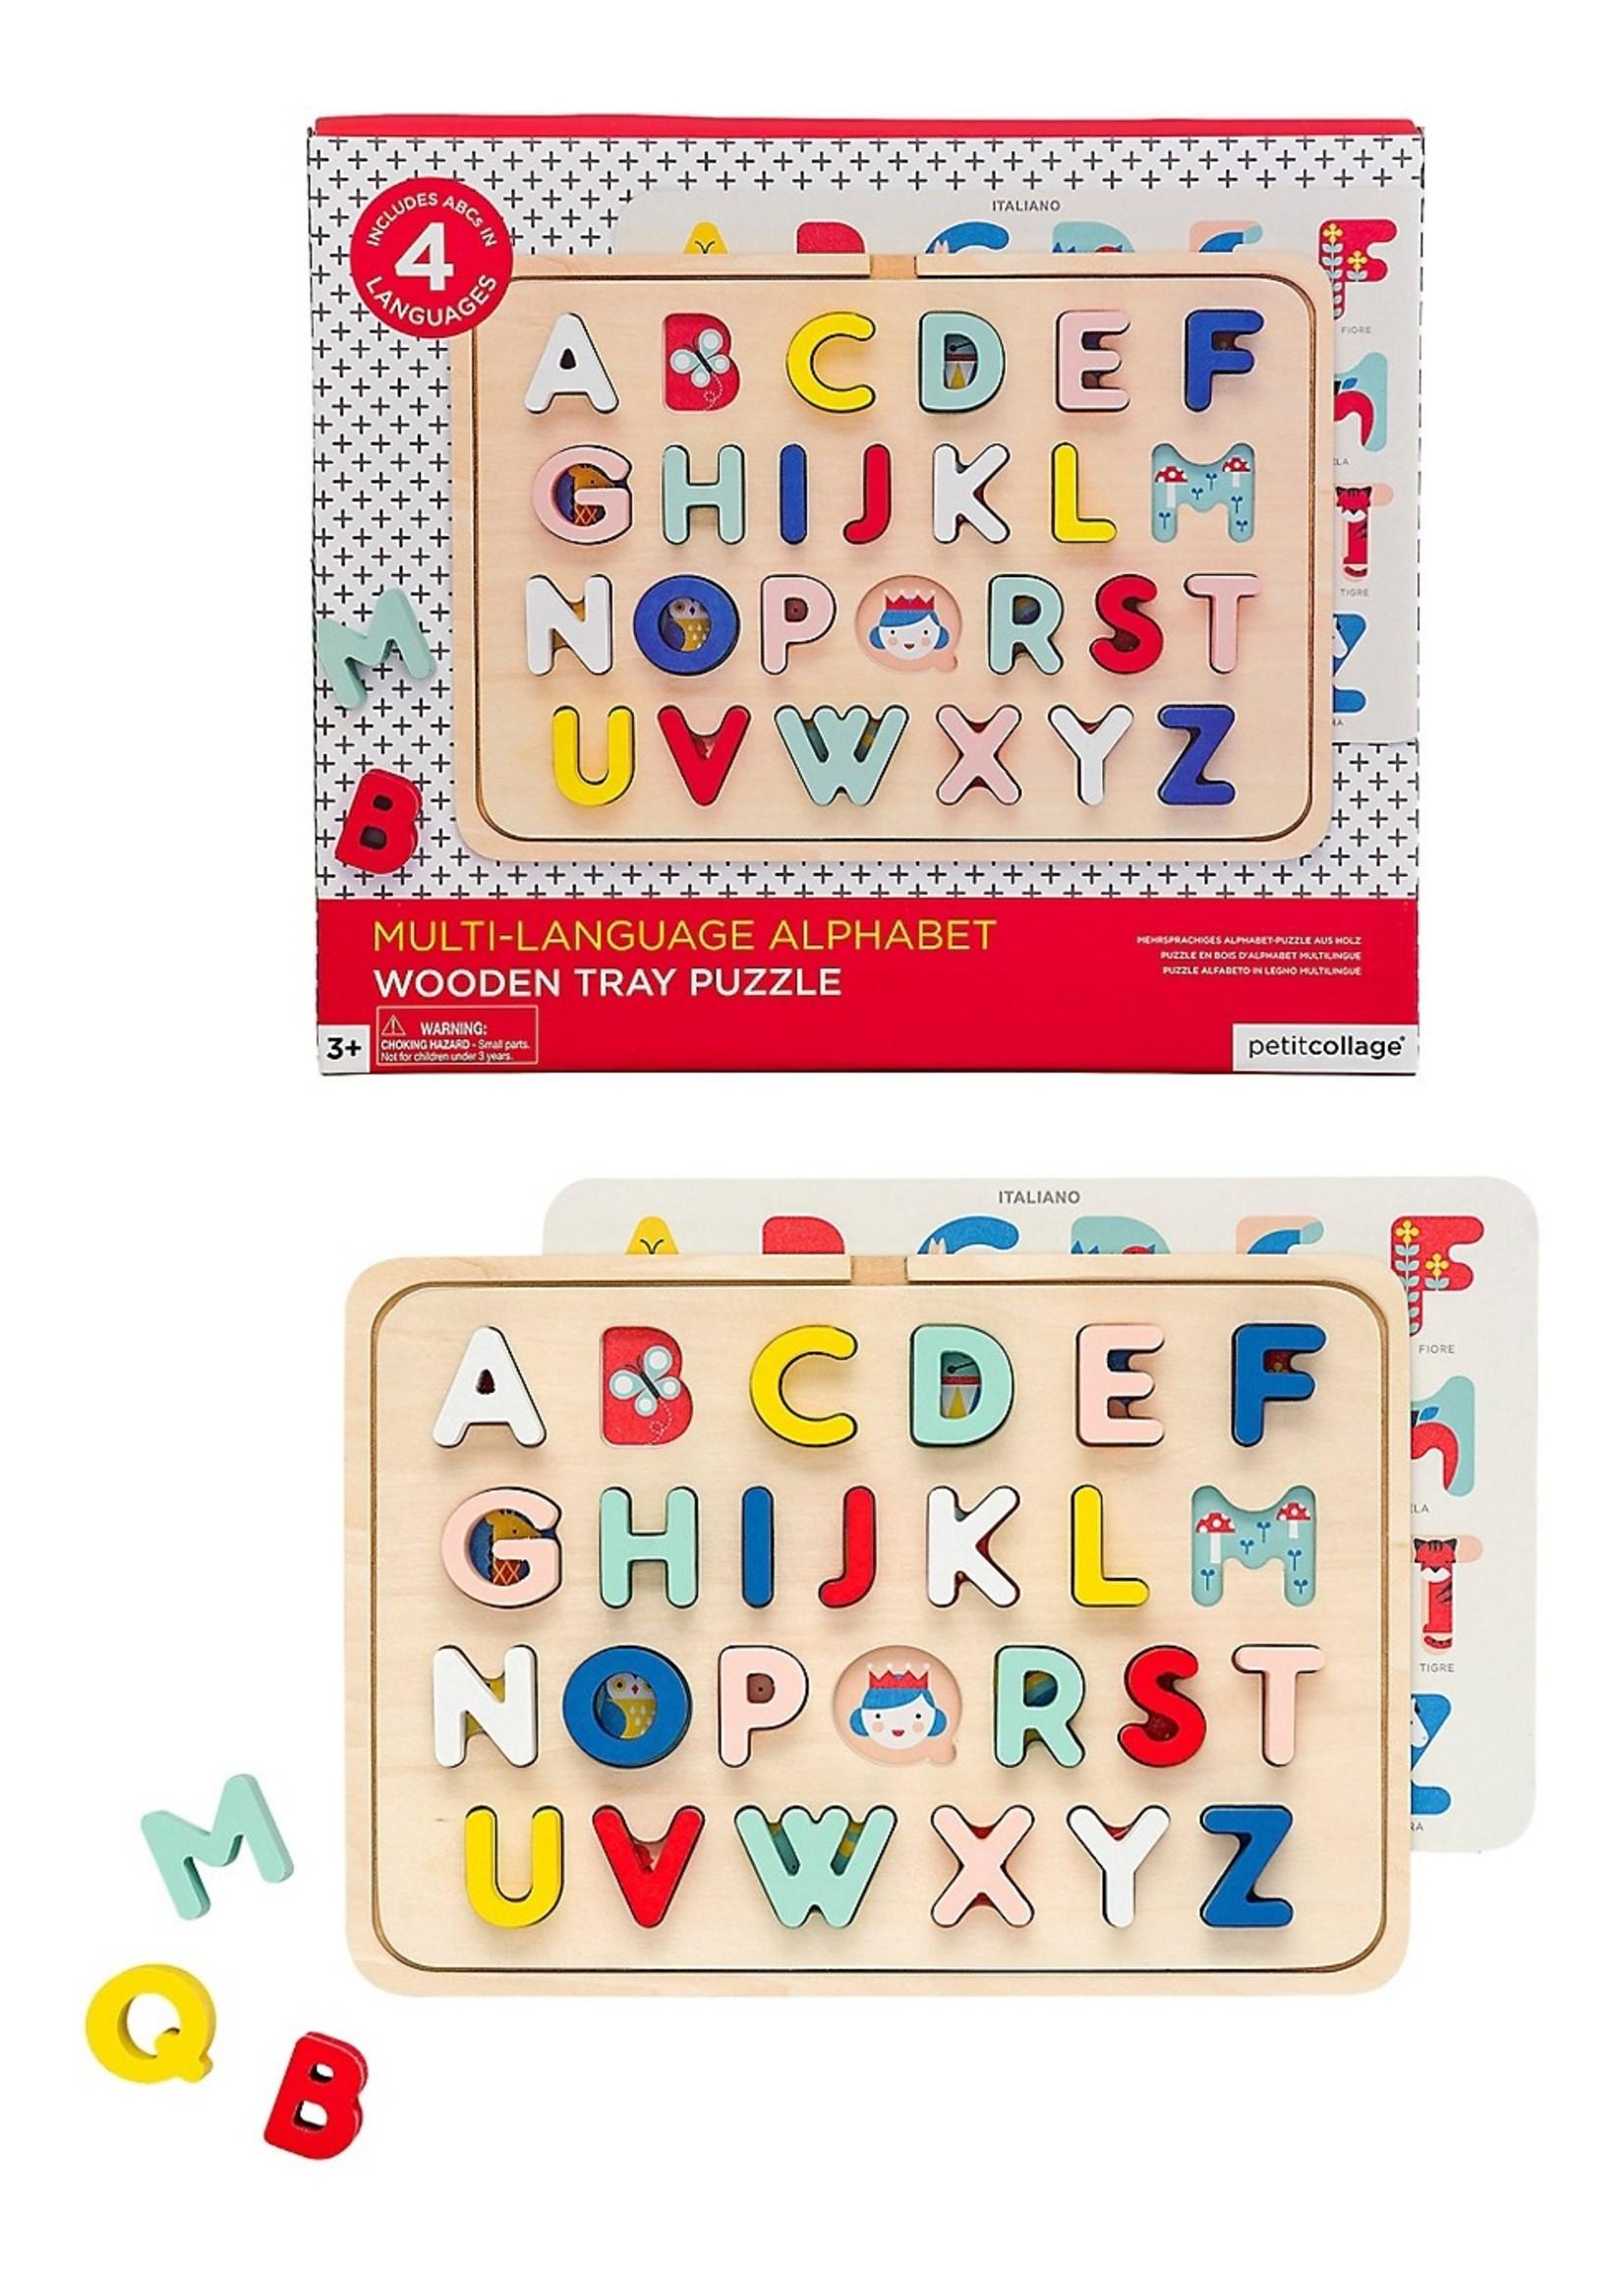 Petit collage Puzzle Alphabet 6 langues